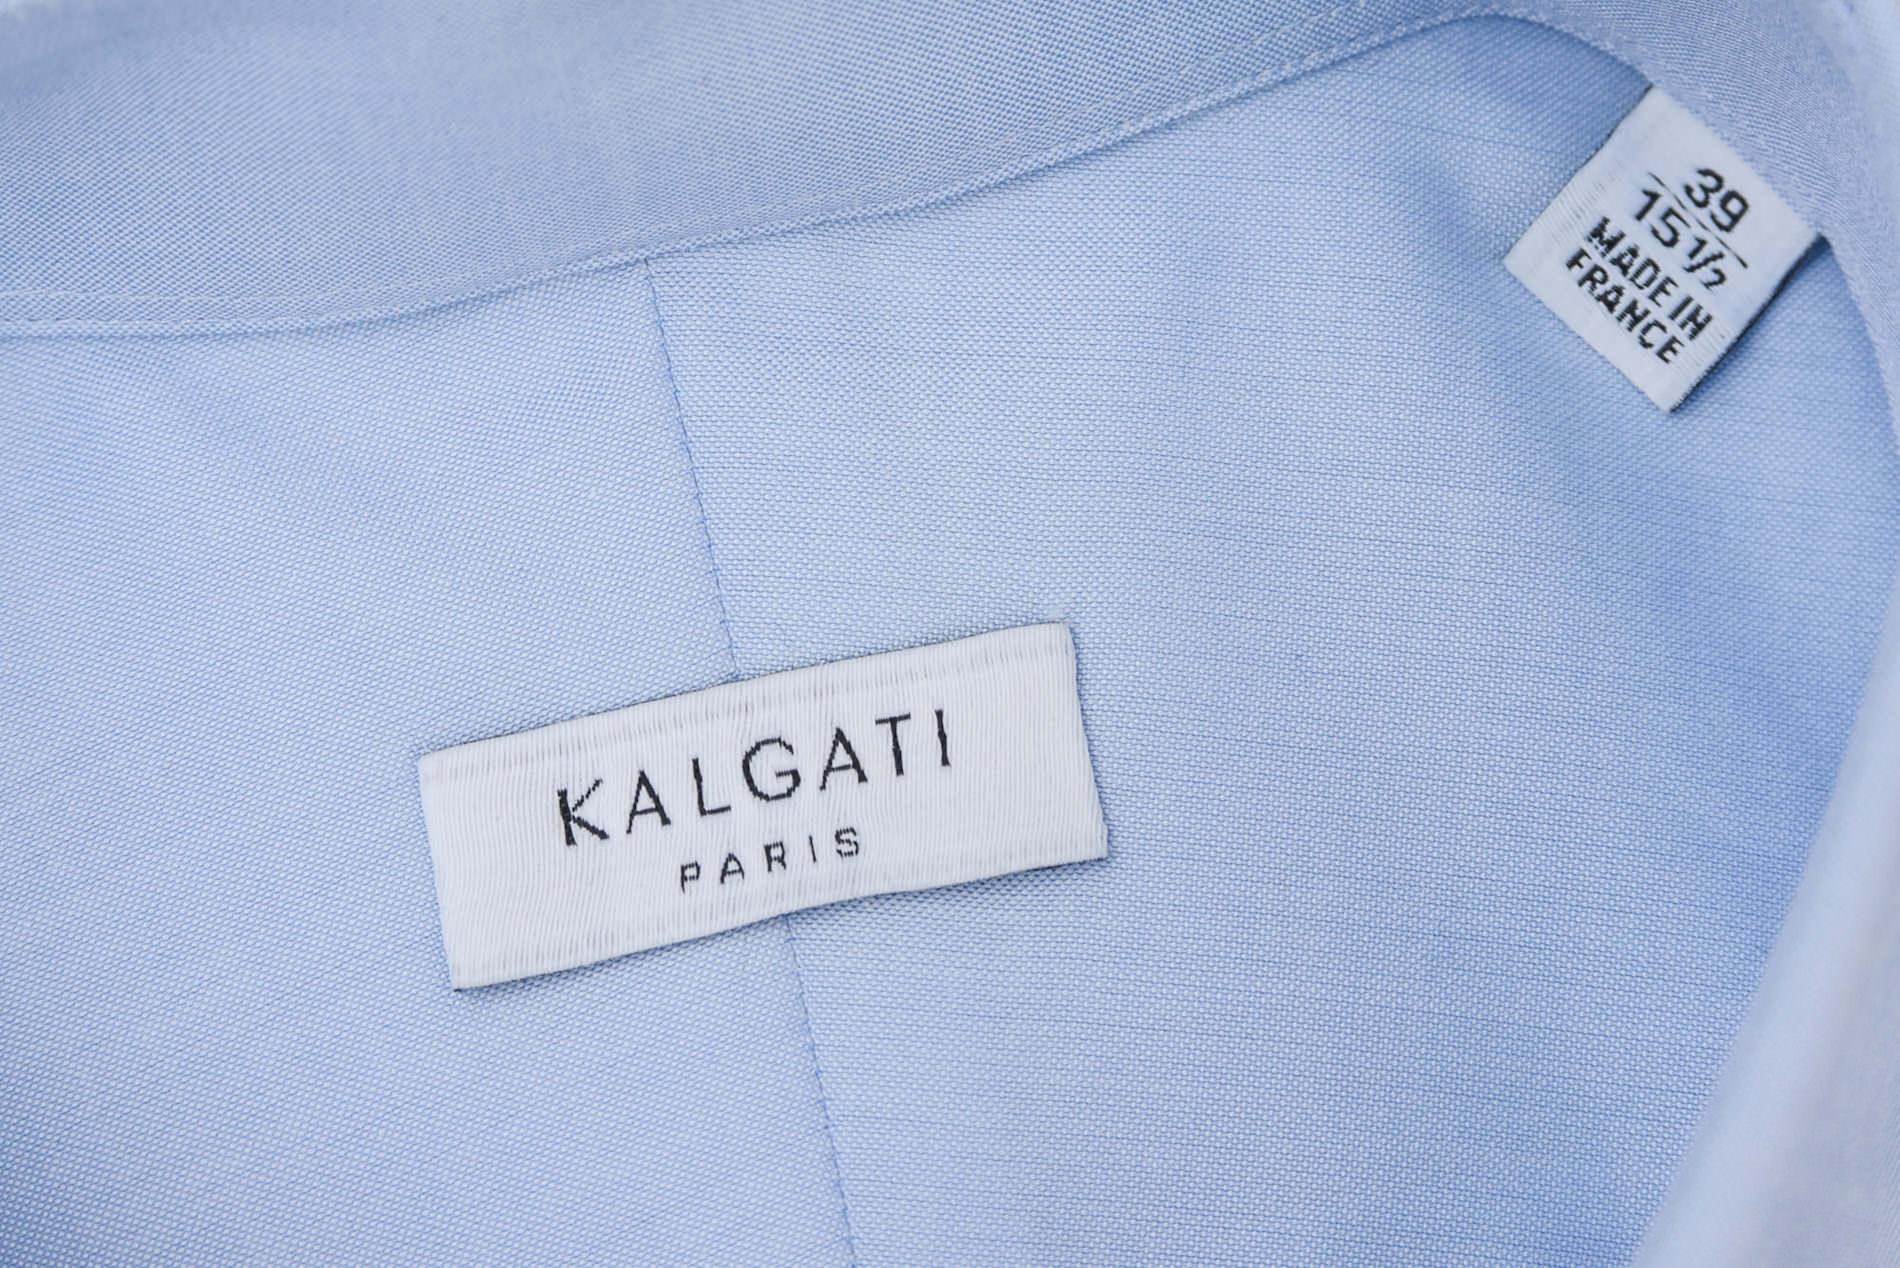 kalgati-x-verygoodlord-4-sur-27